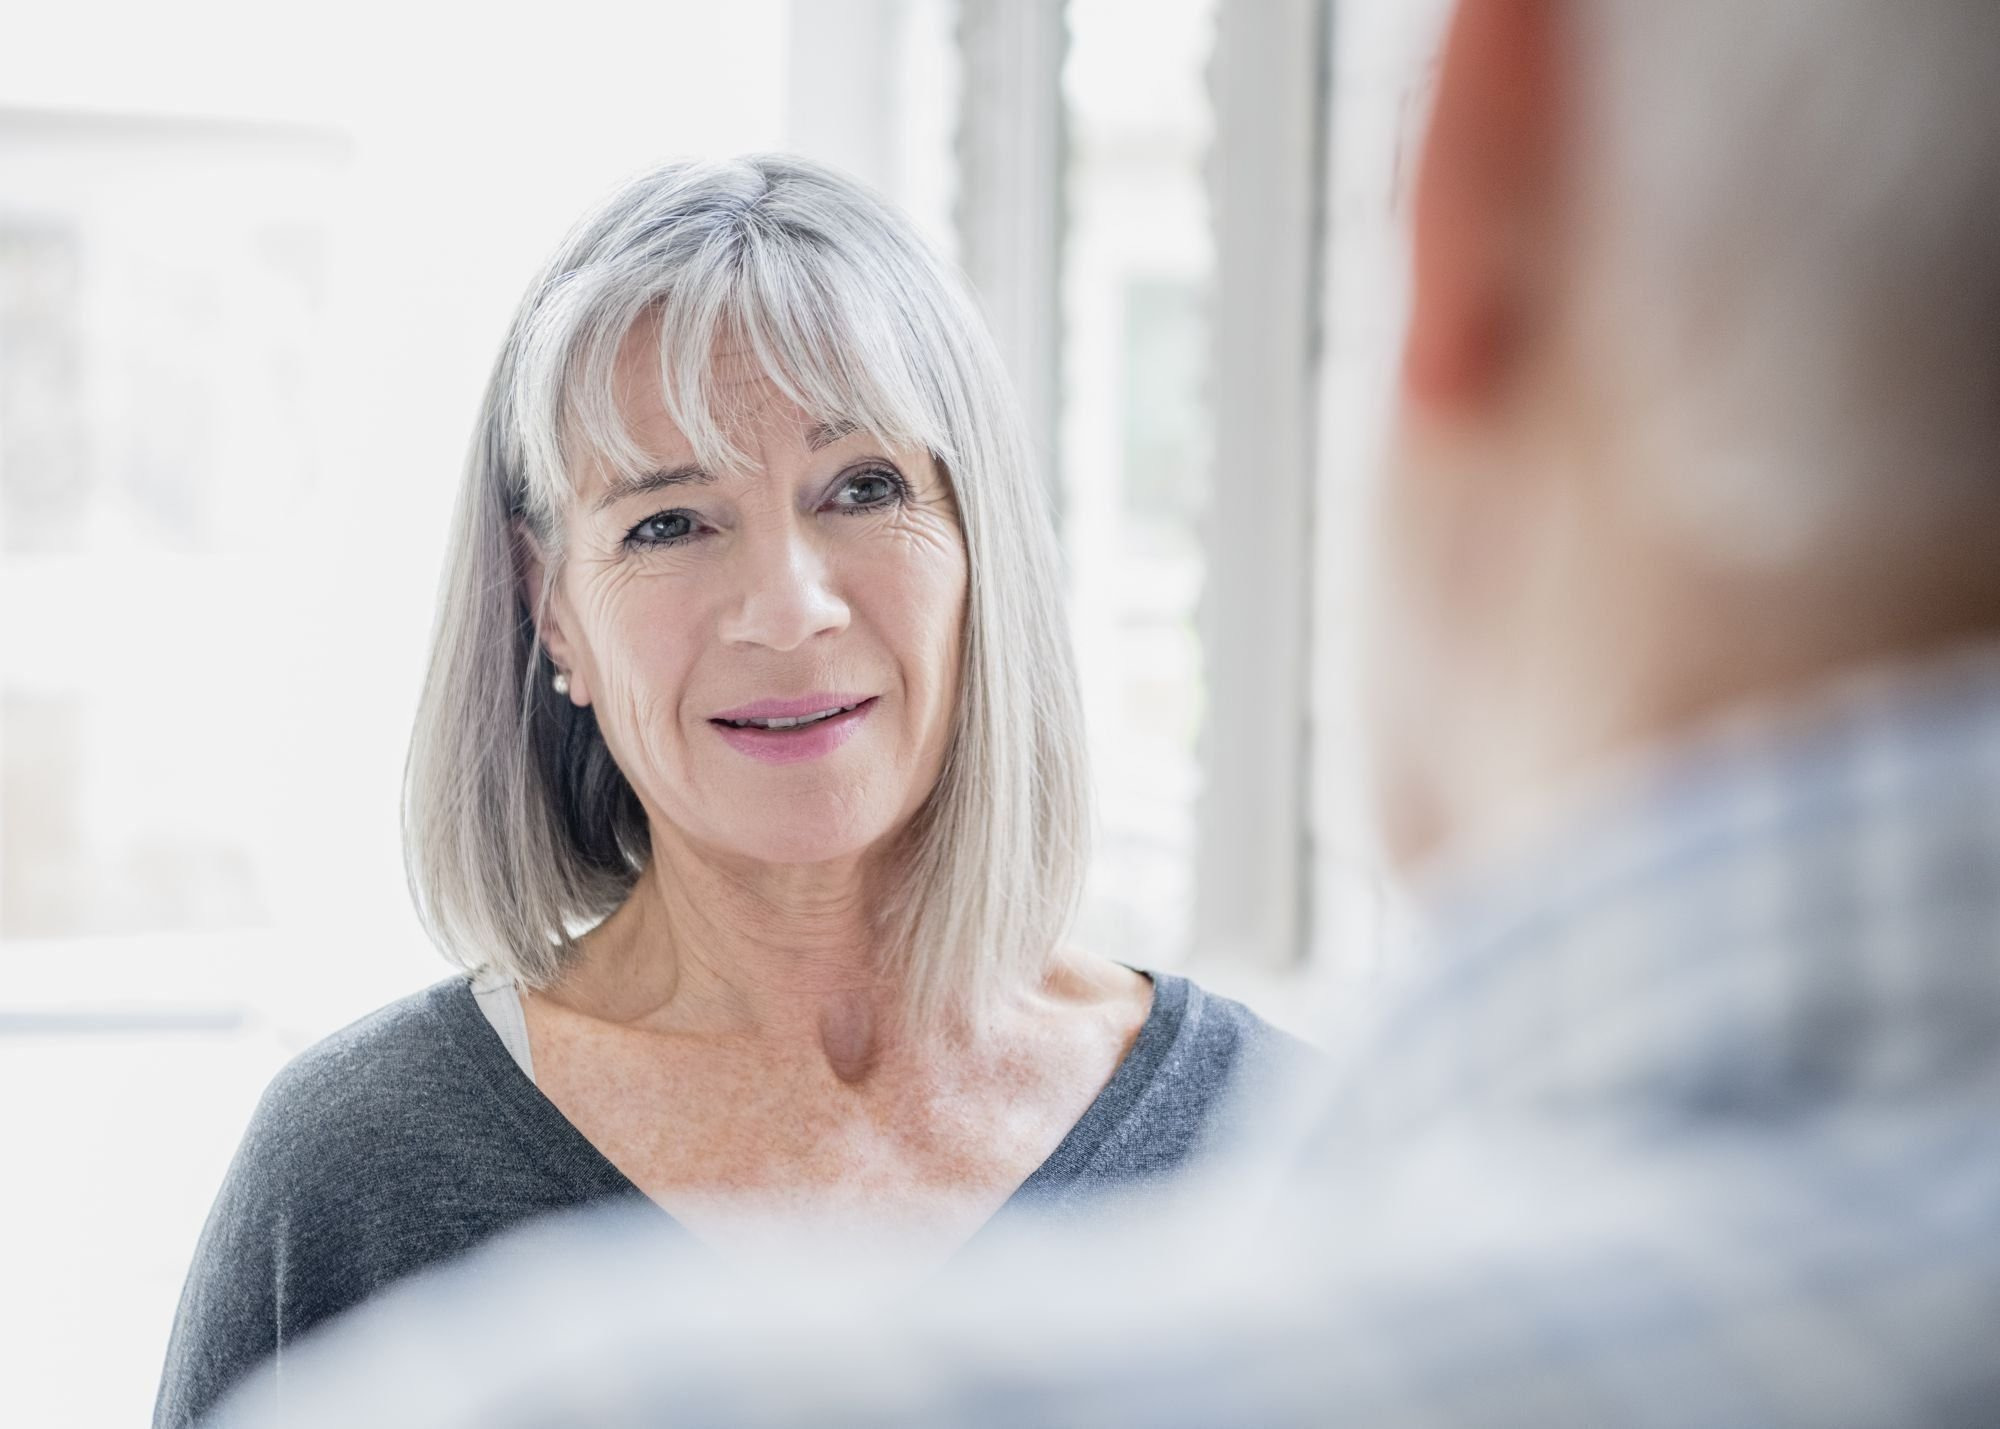 oudere vrouw in gesprek met oudere man